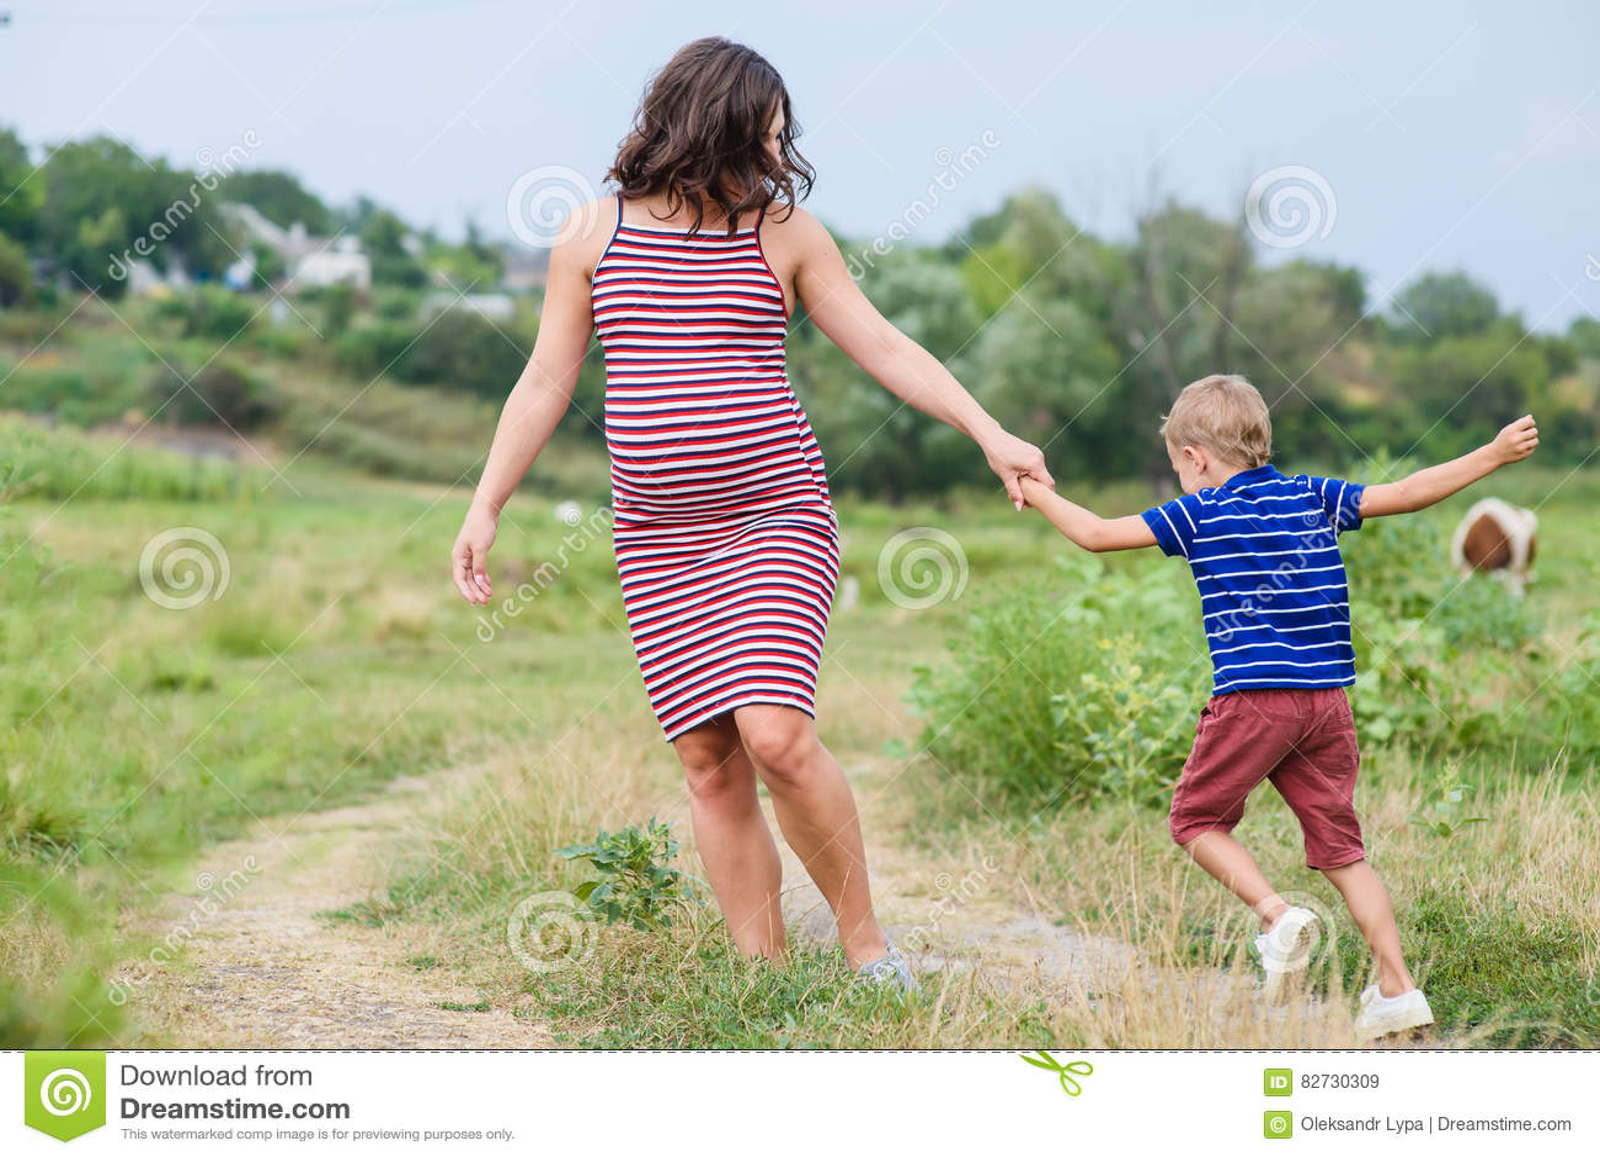 femme enceinte avec son fils photo stock image 82730309. Black Bedroom Furniture Sets. Home Design Ideas